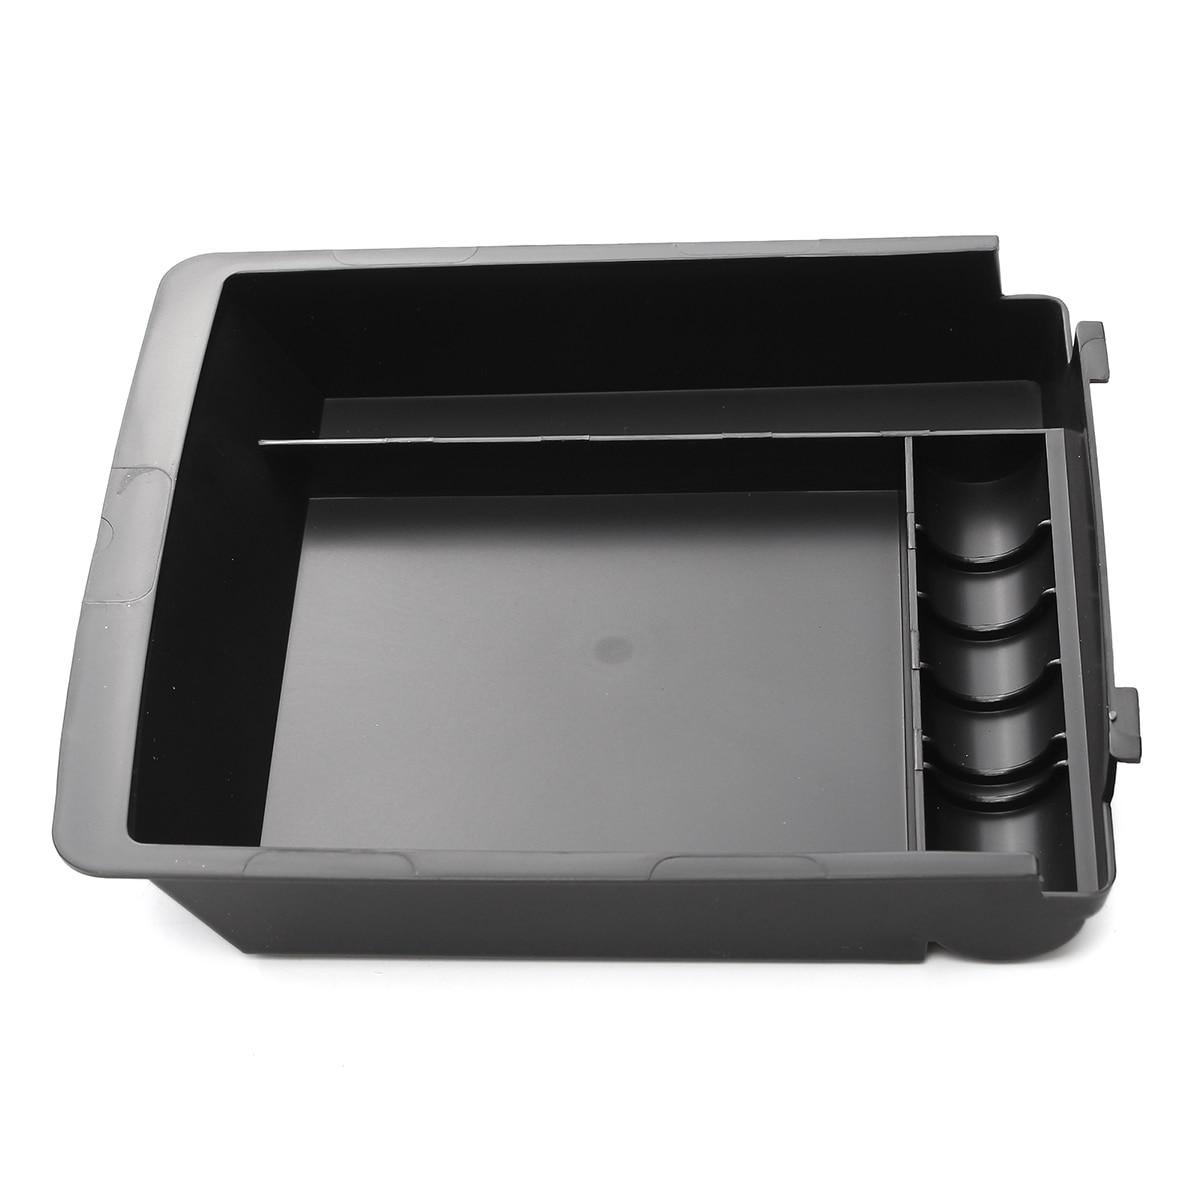 ABS Armrest Secondary Storage Box Center Console For HYUNDAI for ELANTRA 2011 2012 2013 2014 2015 187*165*35mm